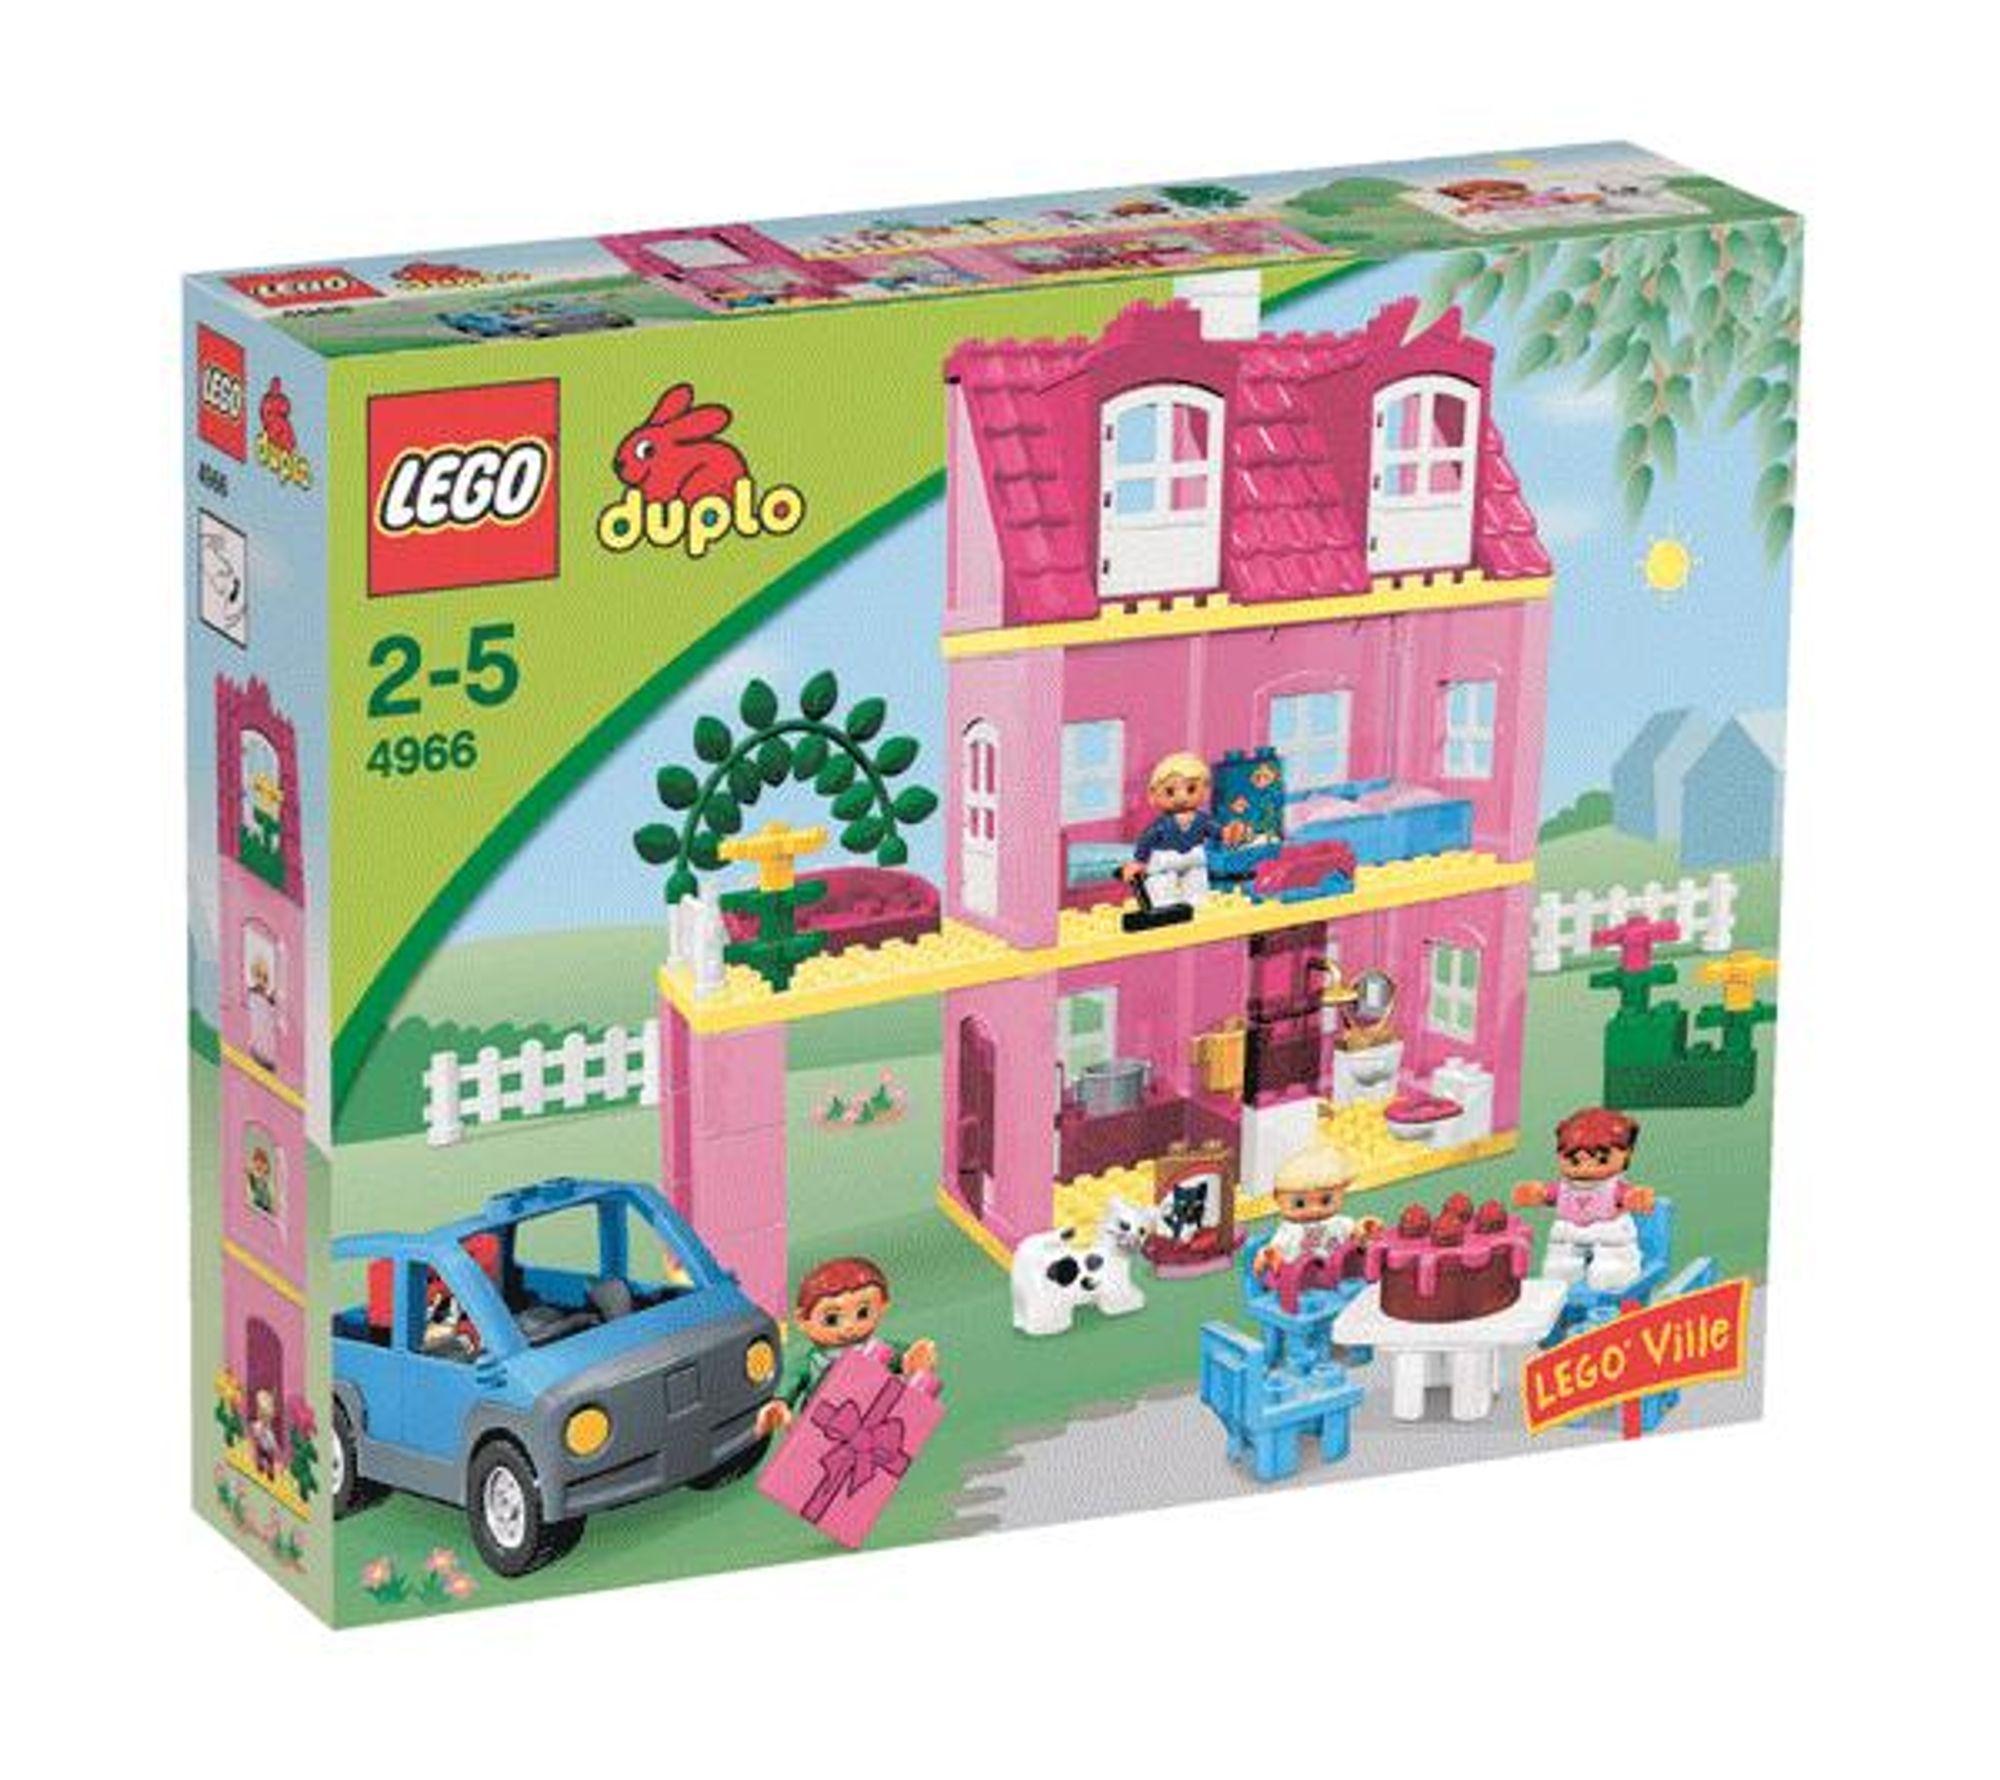 Lego duplo dukkehus priser tester og tilbud lego for Adventskalender duplo